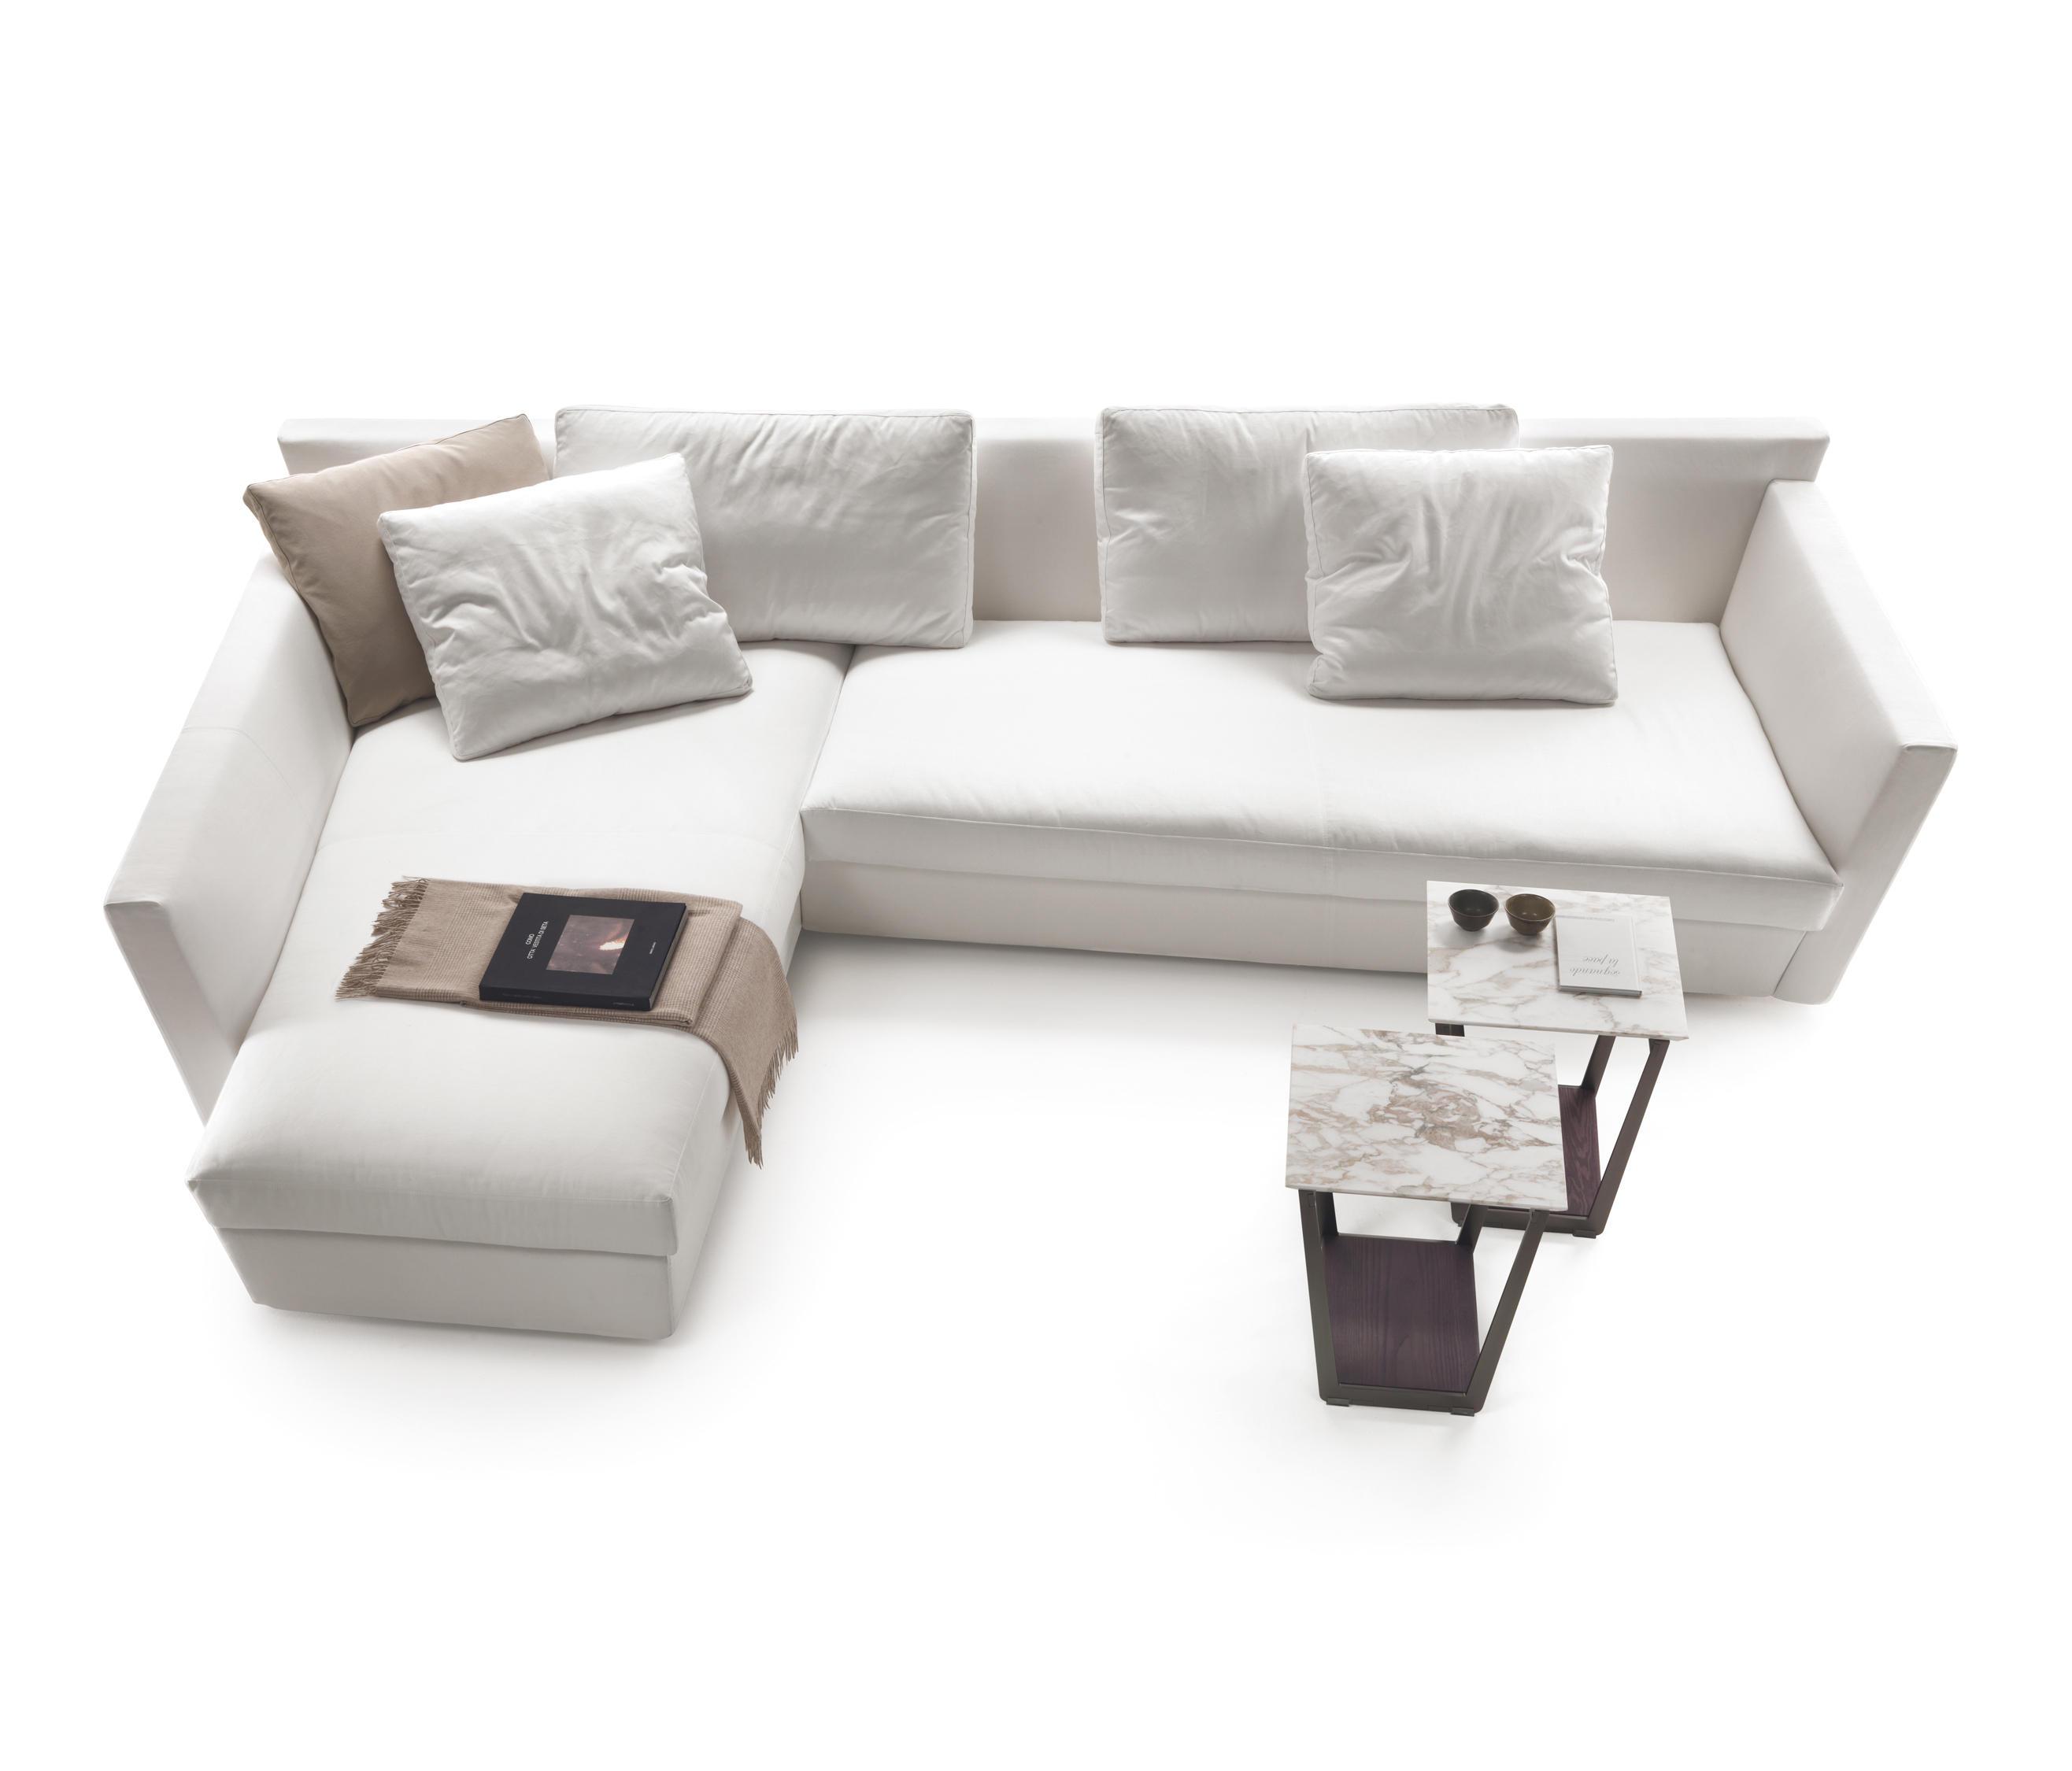 adagio si ges modulaires de flexform architonic. Black Bedroom Furniture Sets. Home Design Ideas